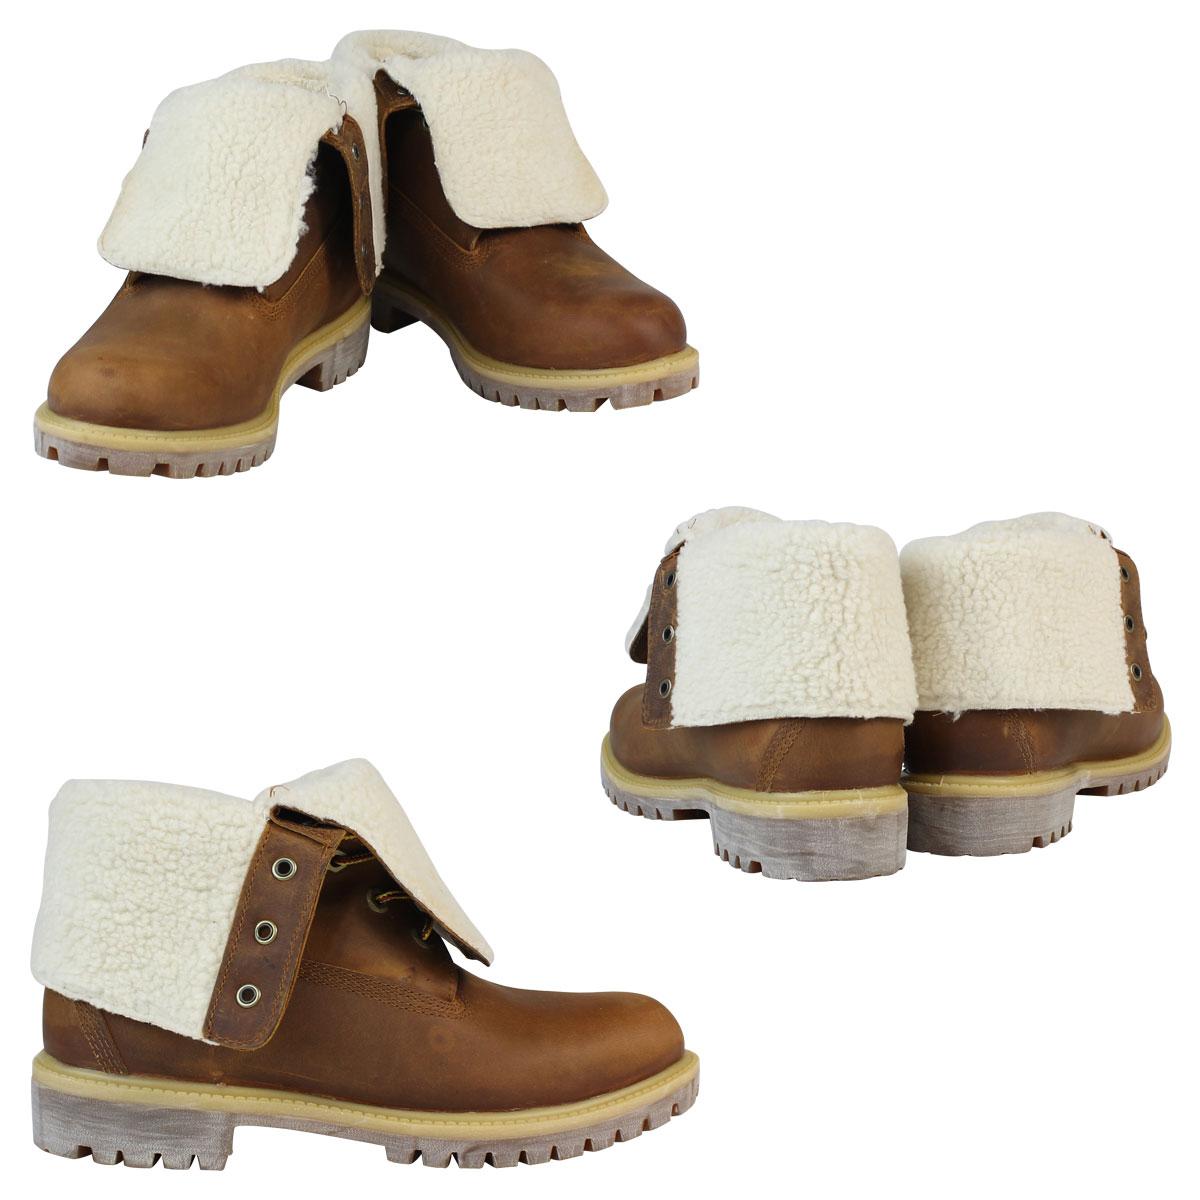 4dd4bba6bed Timberland Timberland boots men HERITAGE FOLD-DOWN WARM FLEECE LINED BOOT  ヘリテージフォルドダウンフリースライン A118Y brown